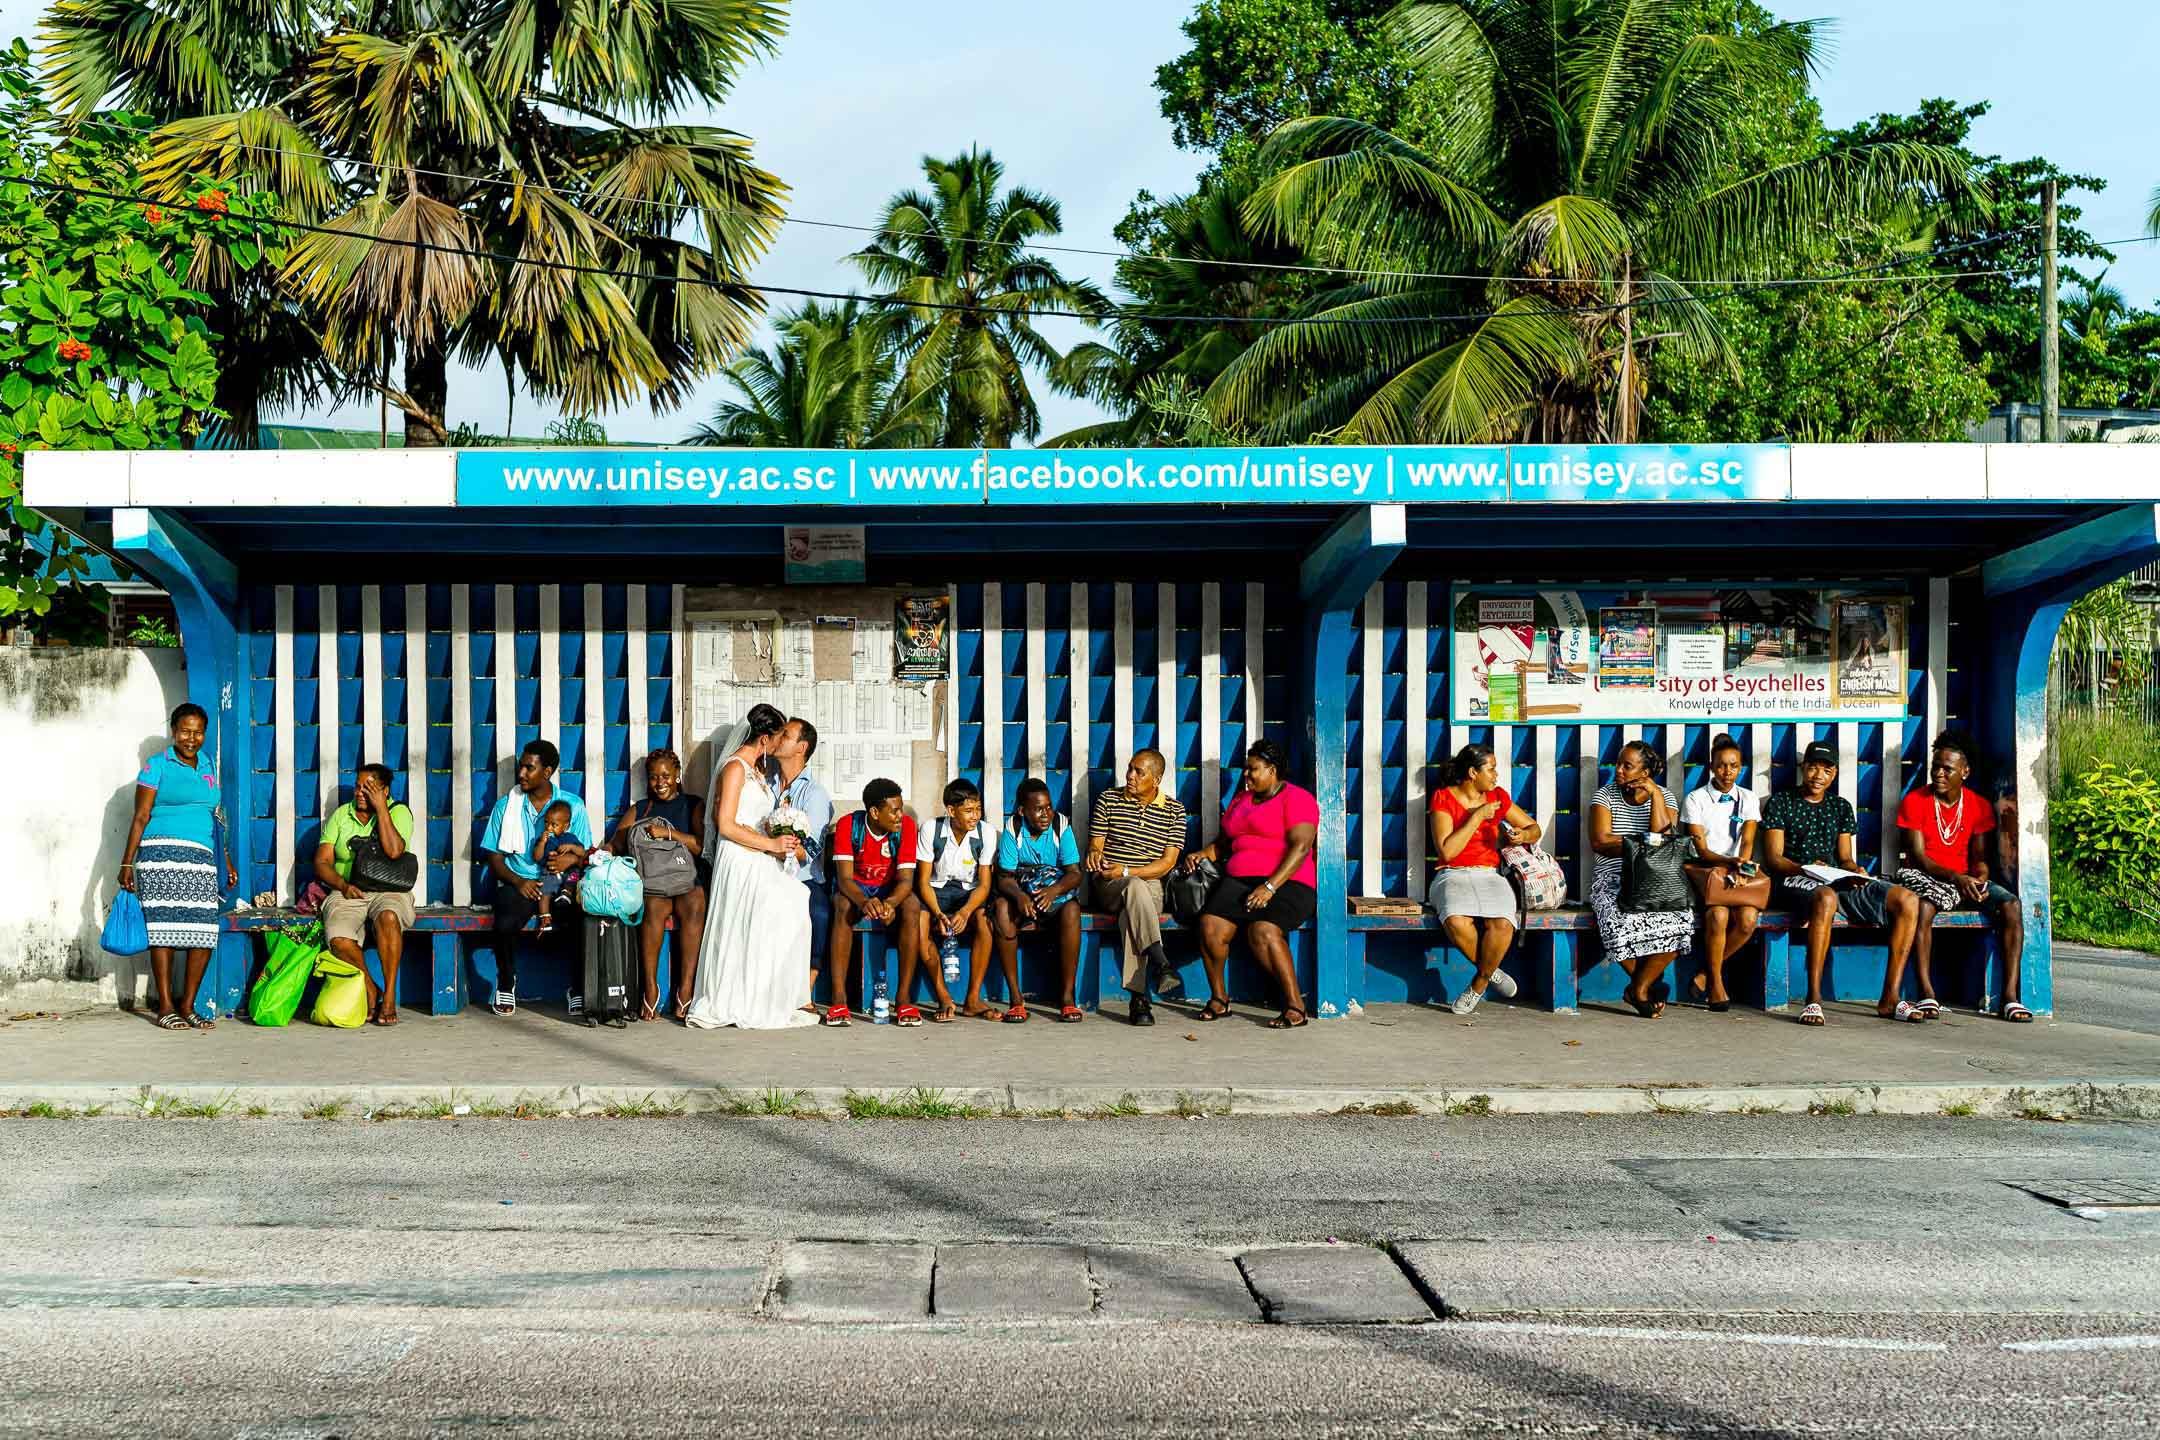 Seychellen-Heiraten.jpg